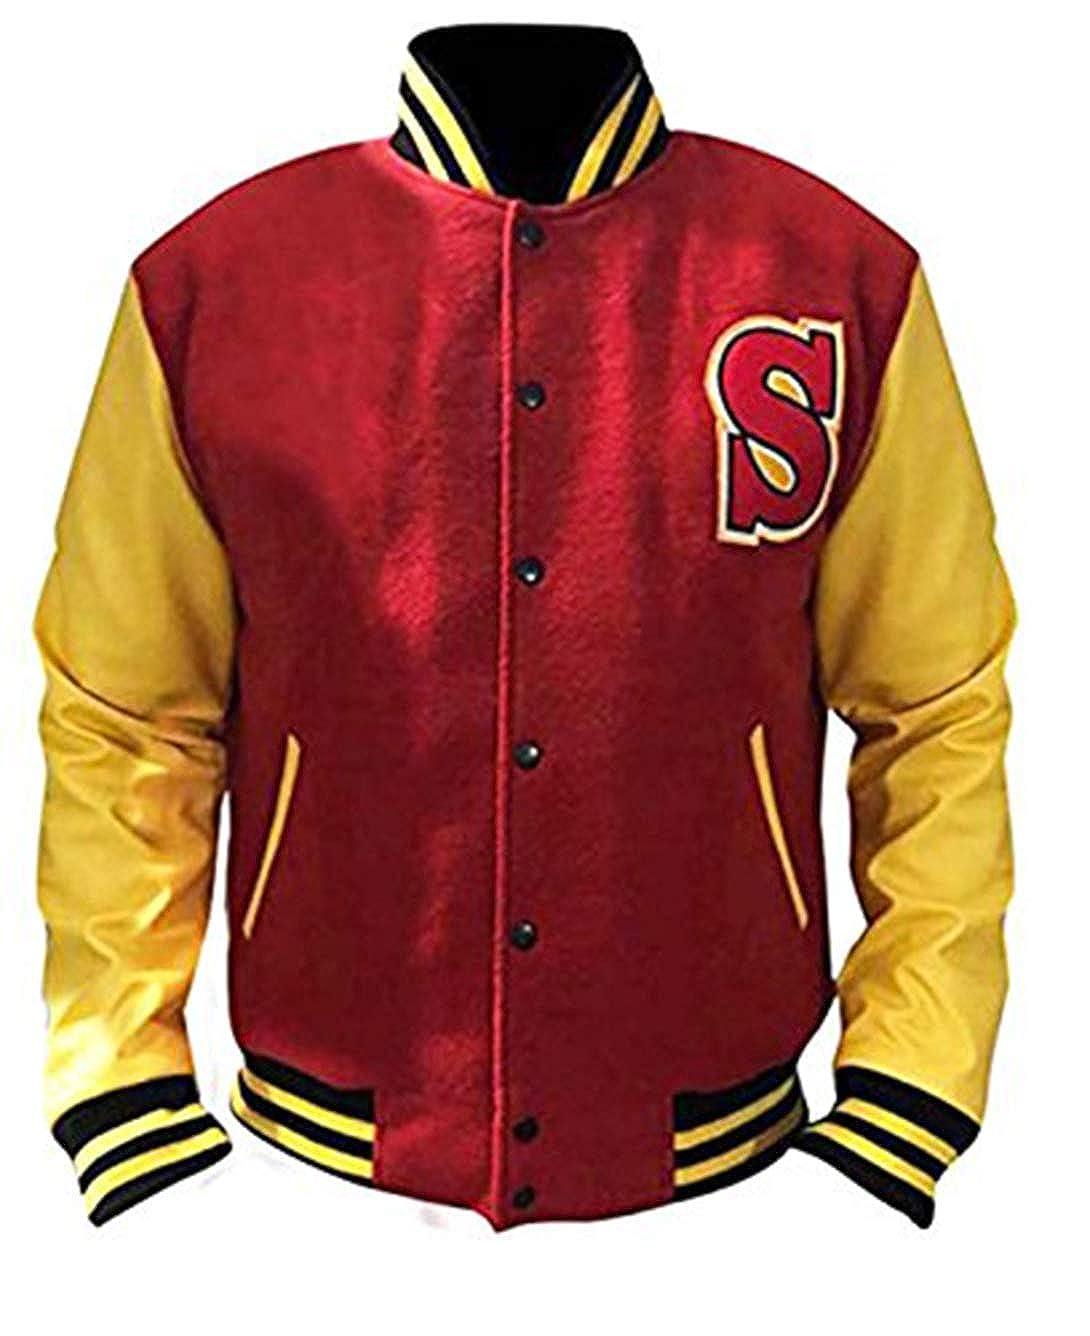 Superman Crows Jacket Smallville Clark Kent Varsity Letterman Bomber Jacket Premium Leather Products PLP--C-V-IM104-BL